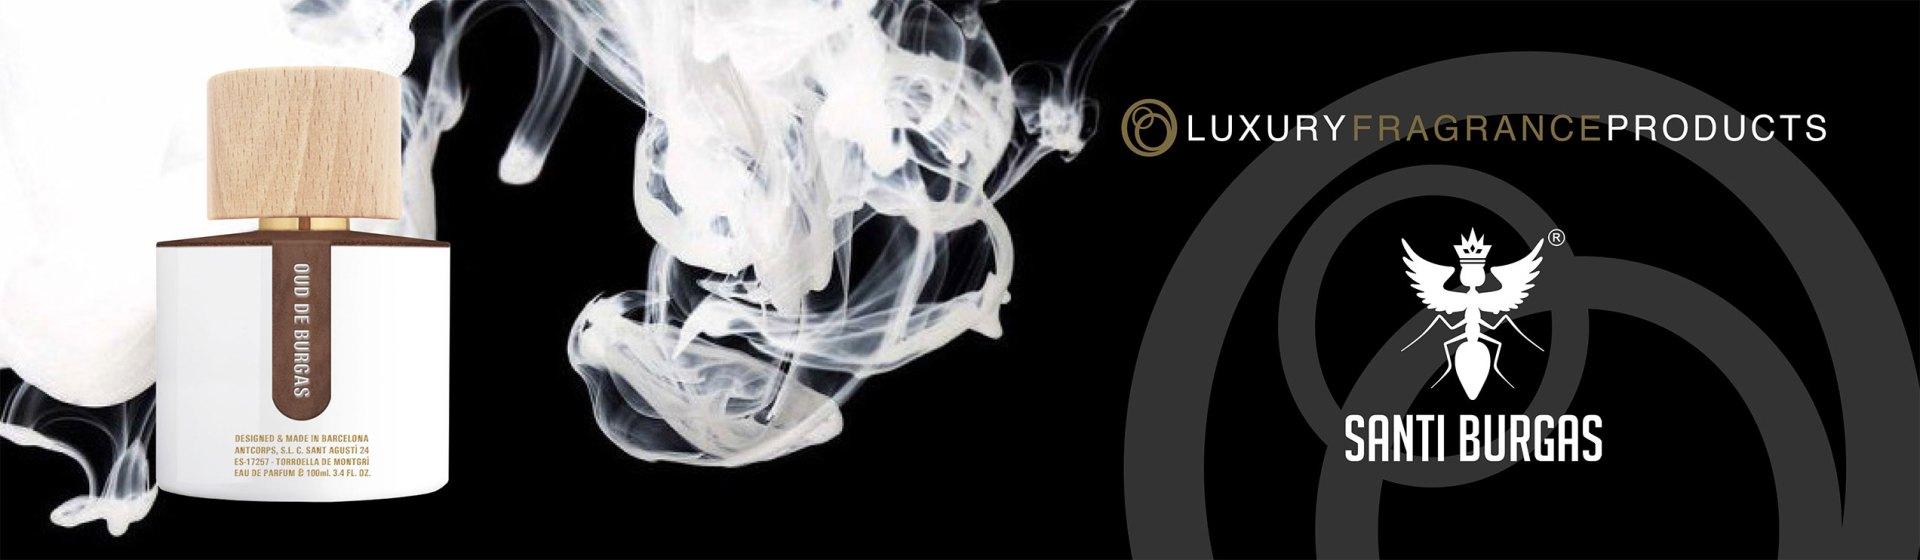 Santi Burgas luxury fragrance products